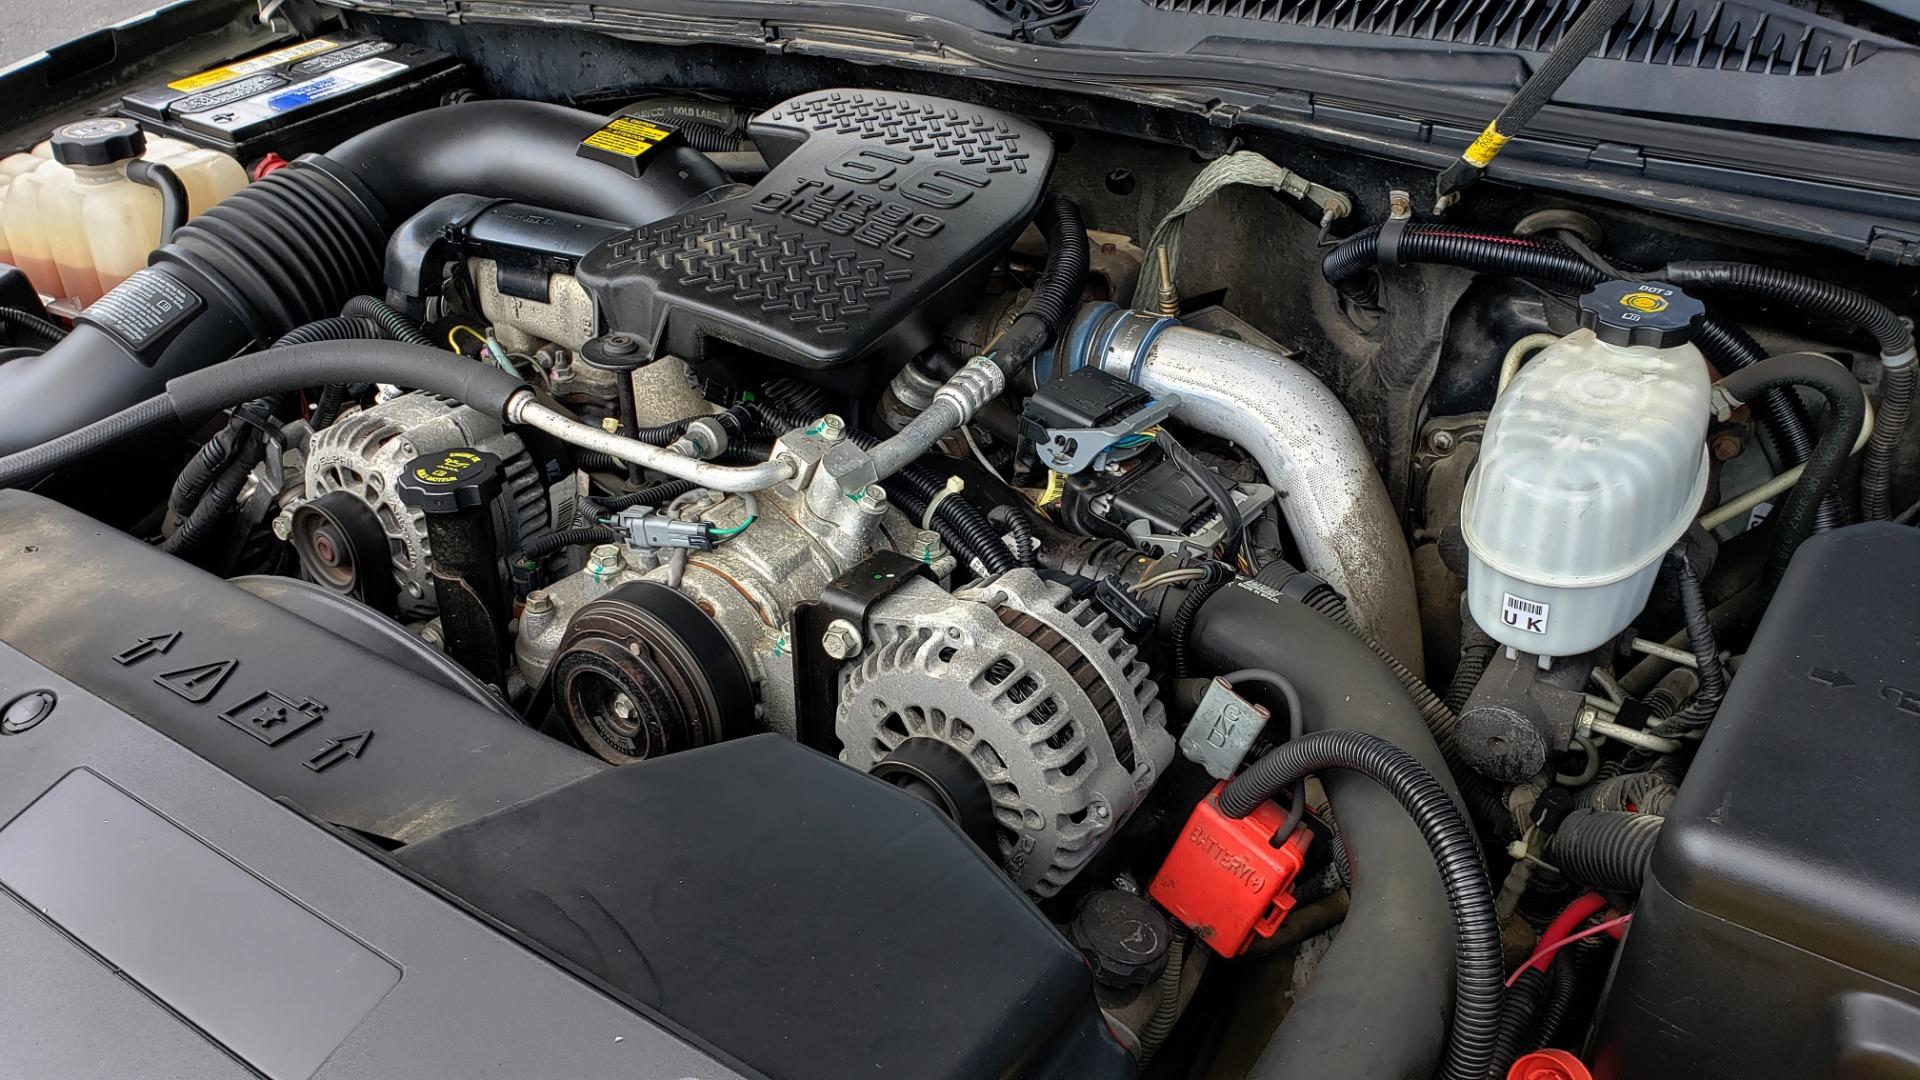 Used 2005 Chevrolet SILVERADO 3500 DRW / 4WD / REG CAB / 6.6L DURAMAX / DOOMSDAY PREPPER for sale $21,595 at Formula Imports in Charlotte NC 28227 70